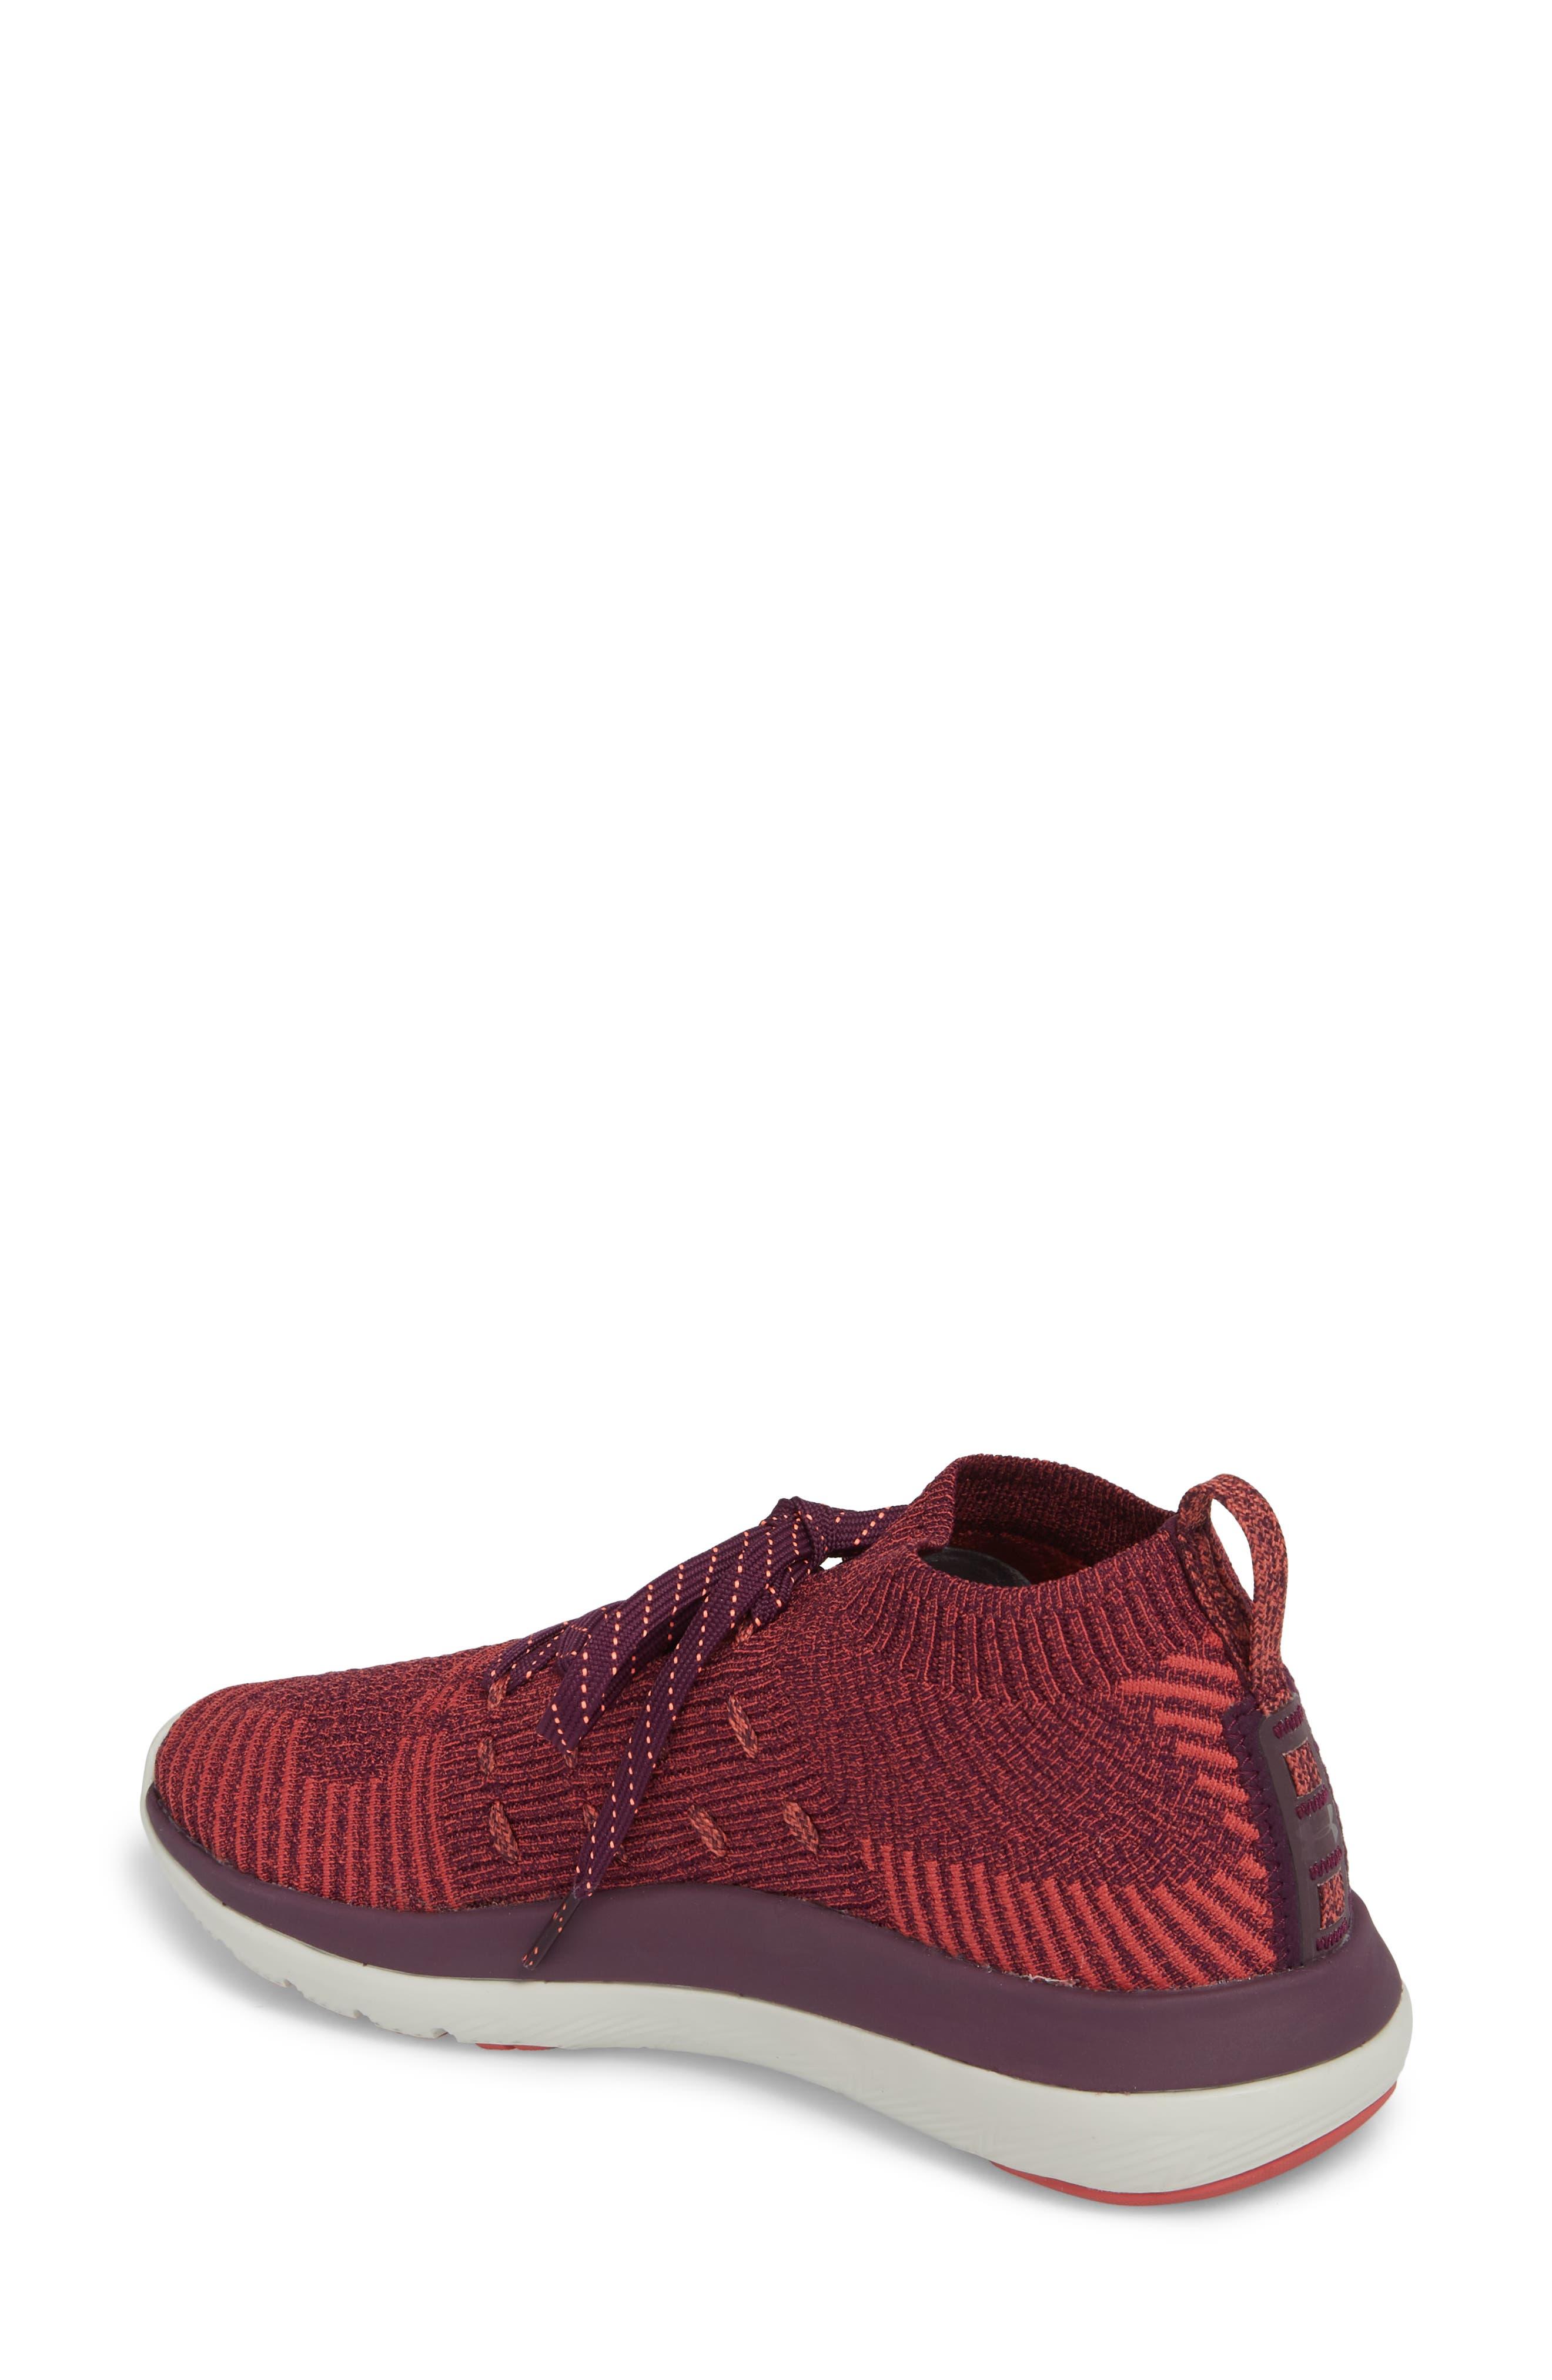 Slingflex Rise Sneaker,                             Alternate thumbnail 6, color,